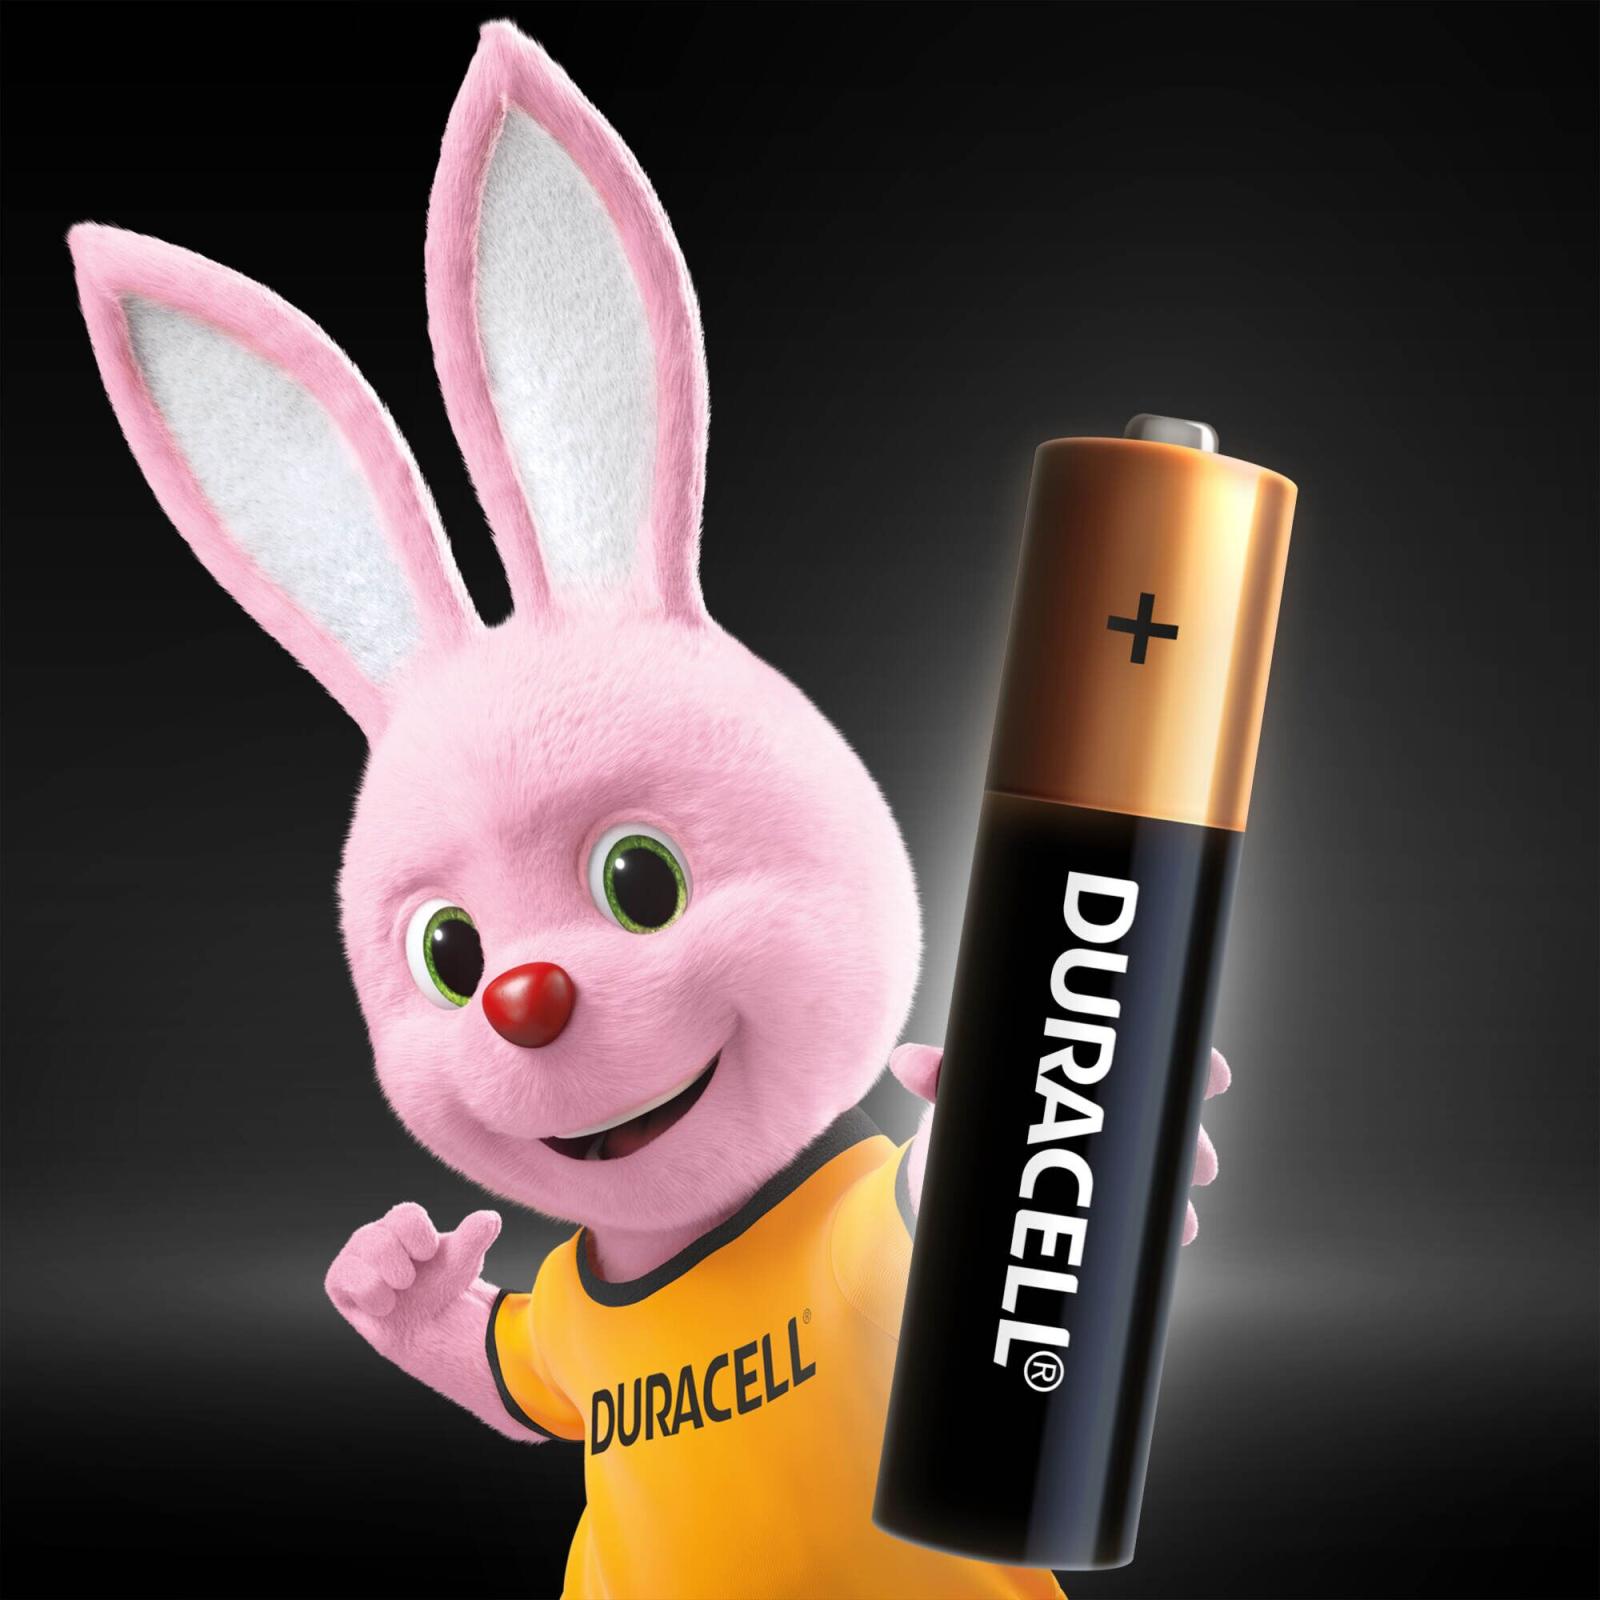 Батарейка Duracell AAA MN2400 LR03 * 2 (5000394058170 / 81484984) изображение 3